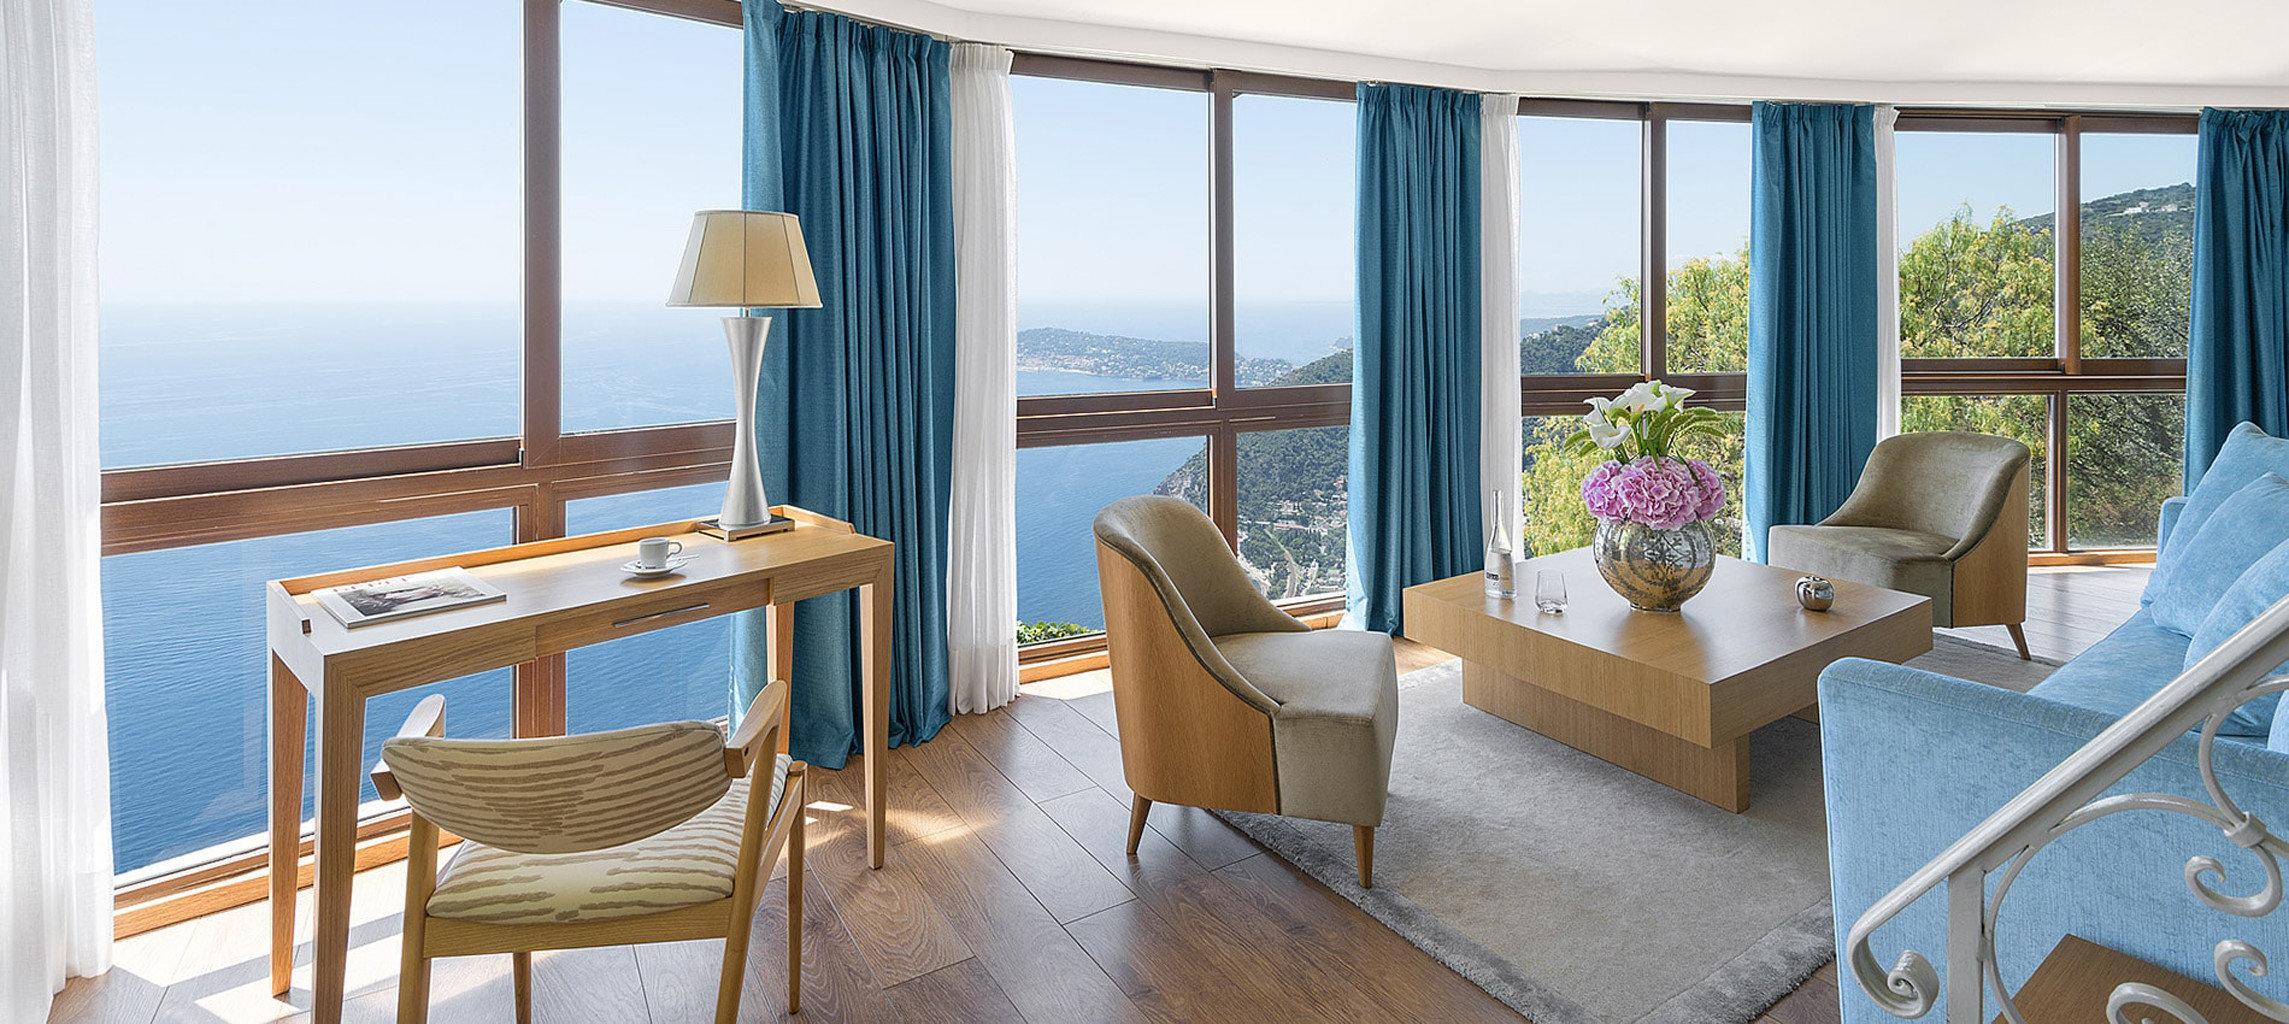 chair property house home cottage Ocean Suite Resort living room Villa nice condominium overlooking